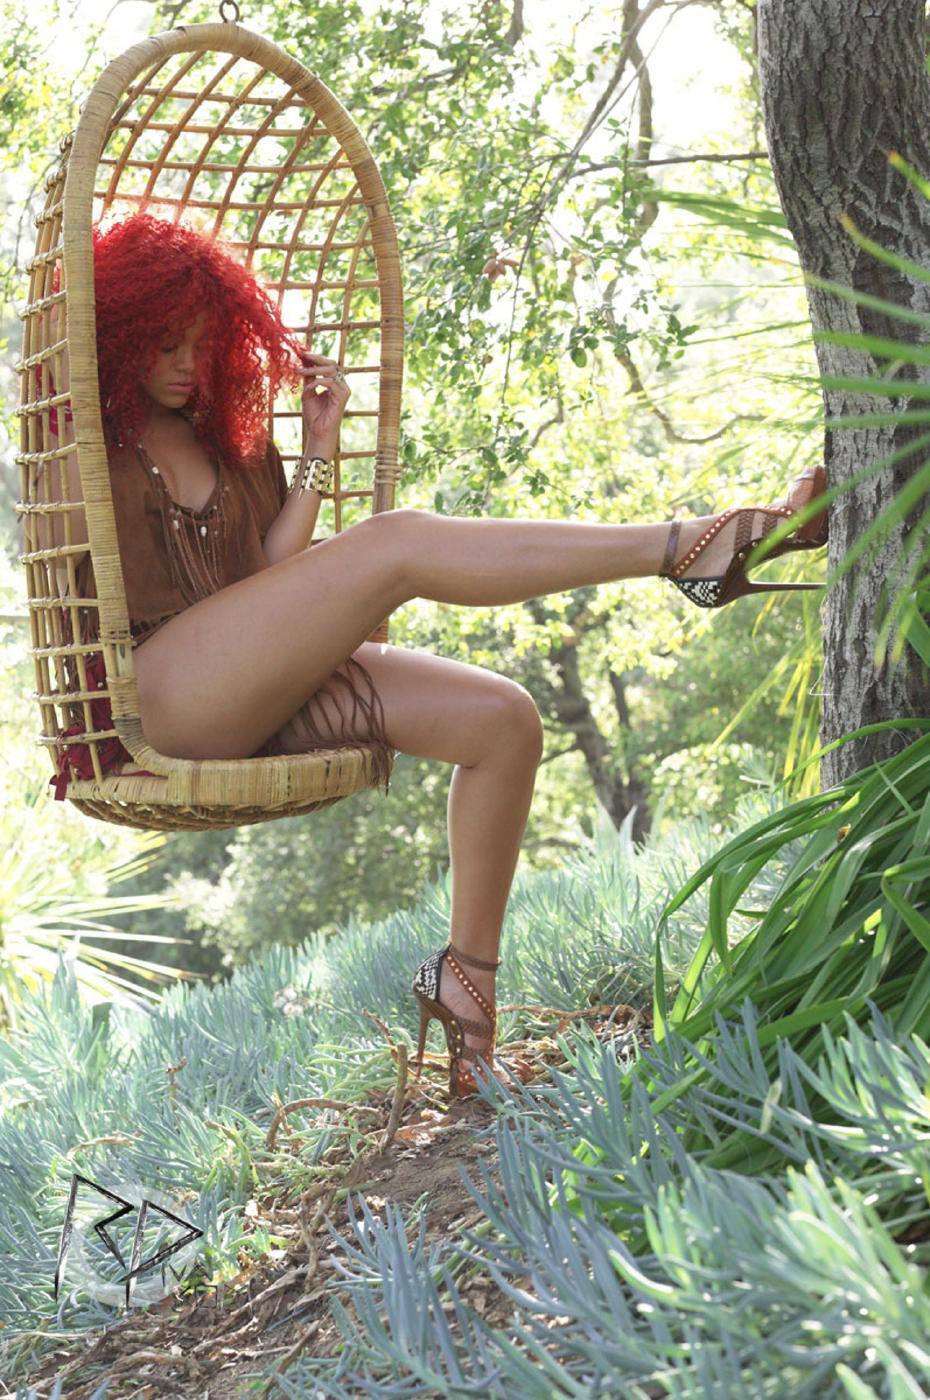 Rihanna Redhead Bikini Photoshoot Set Leaked